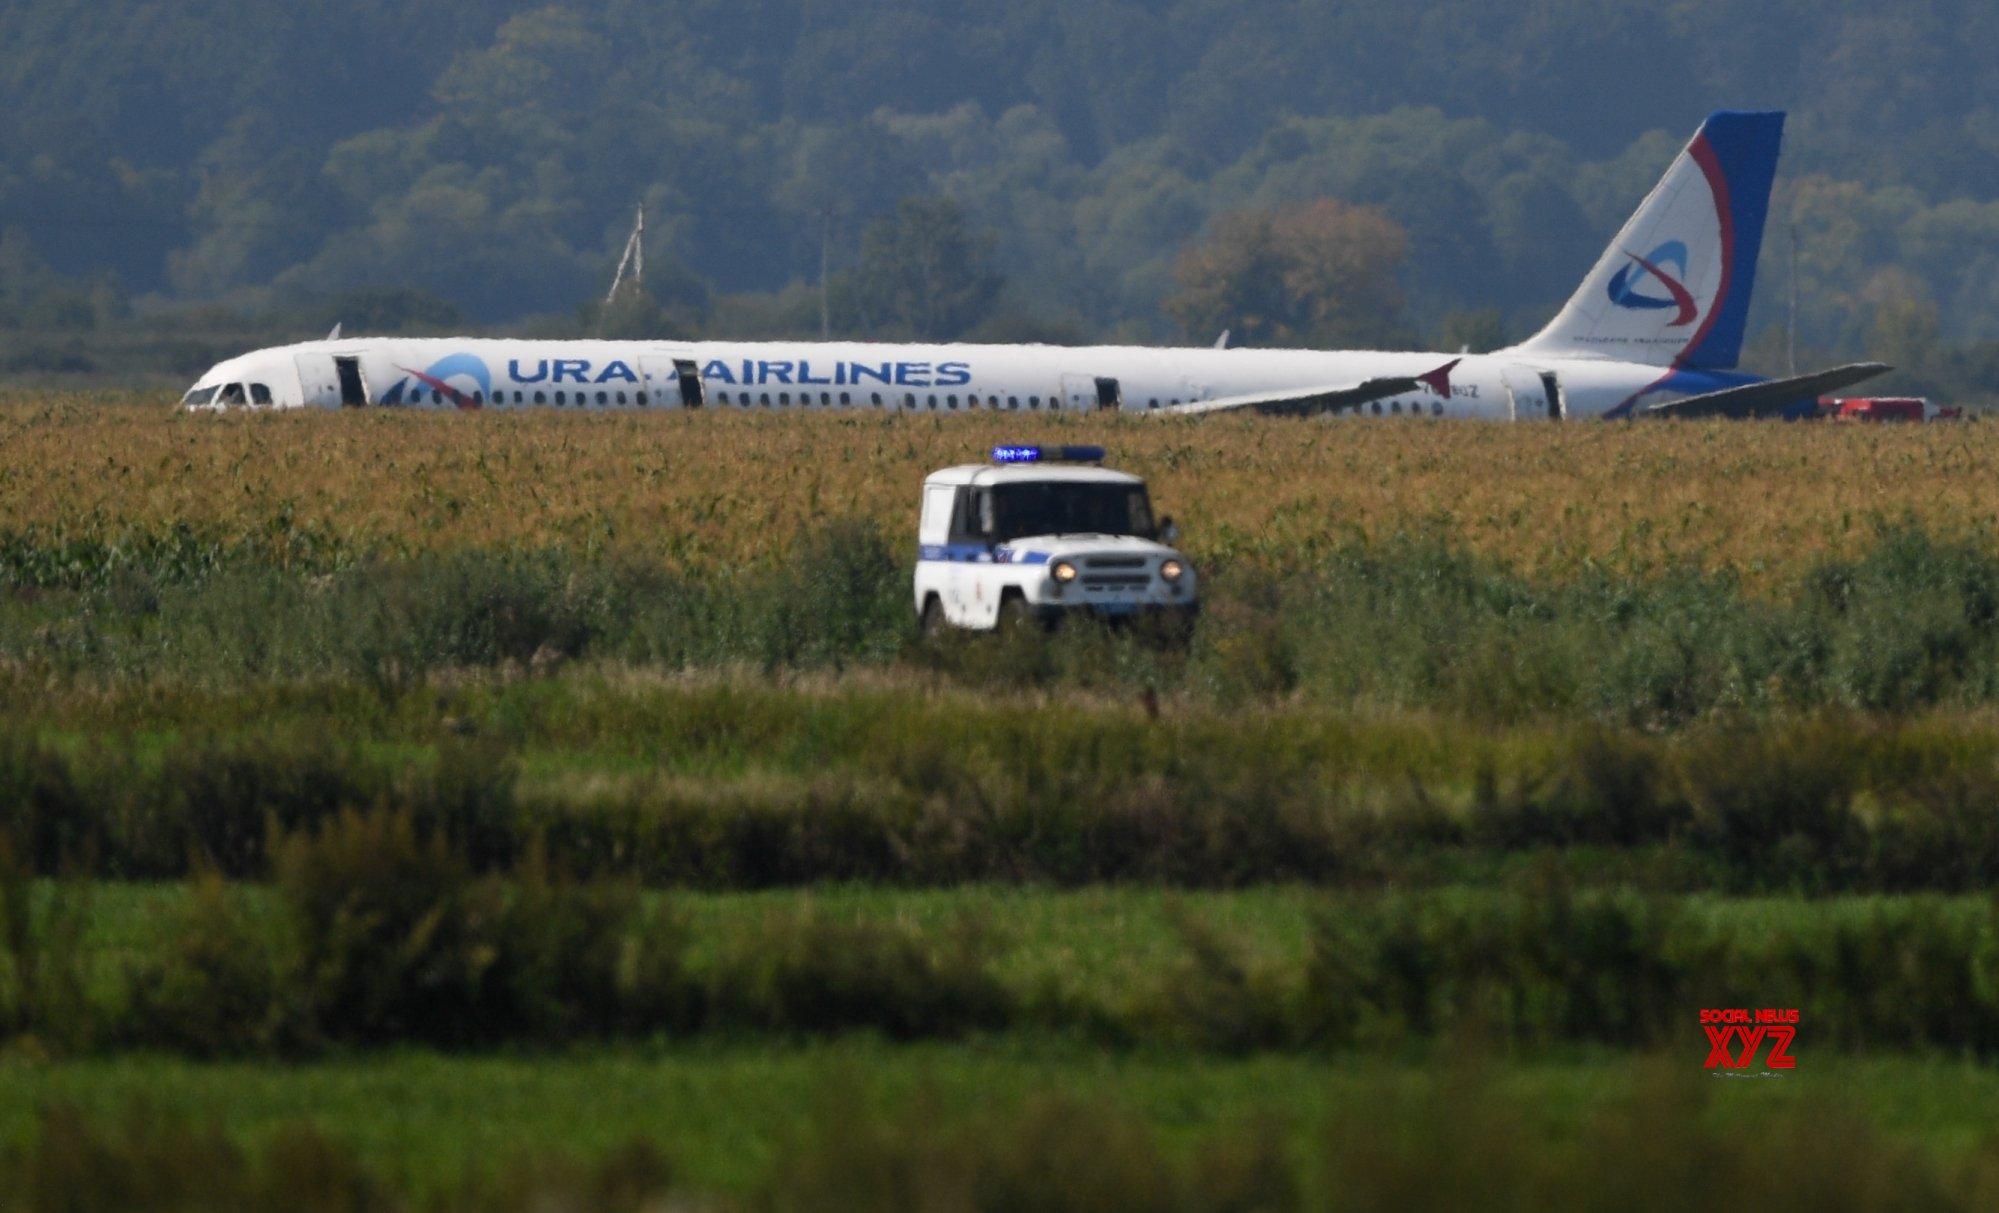 55 injured as Russia jet crash-lands in cornfield